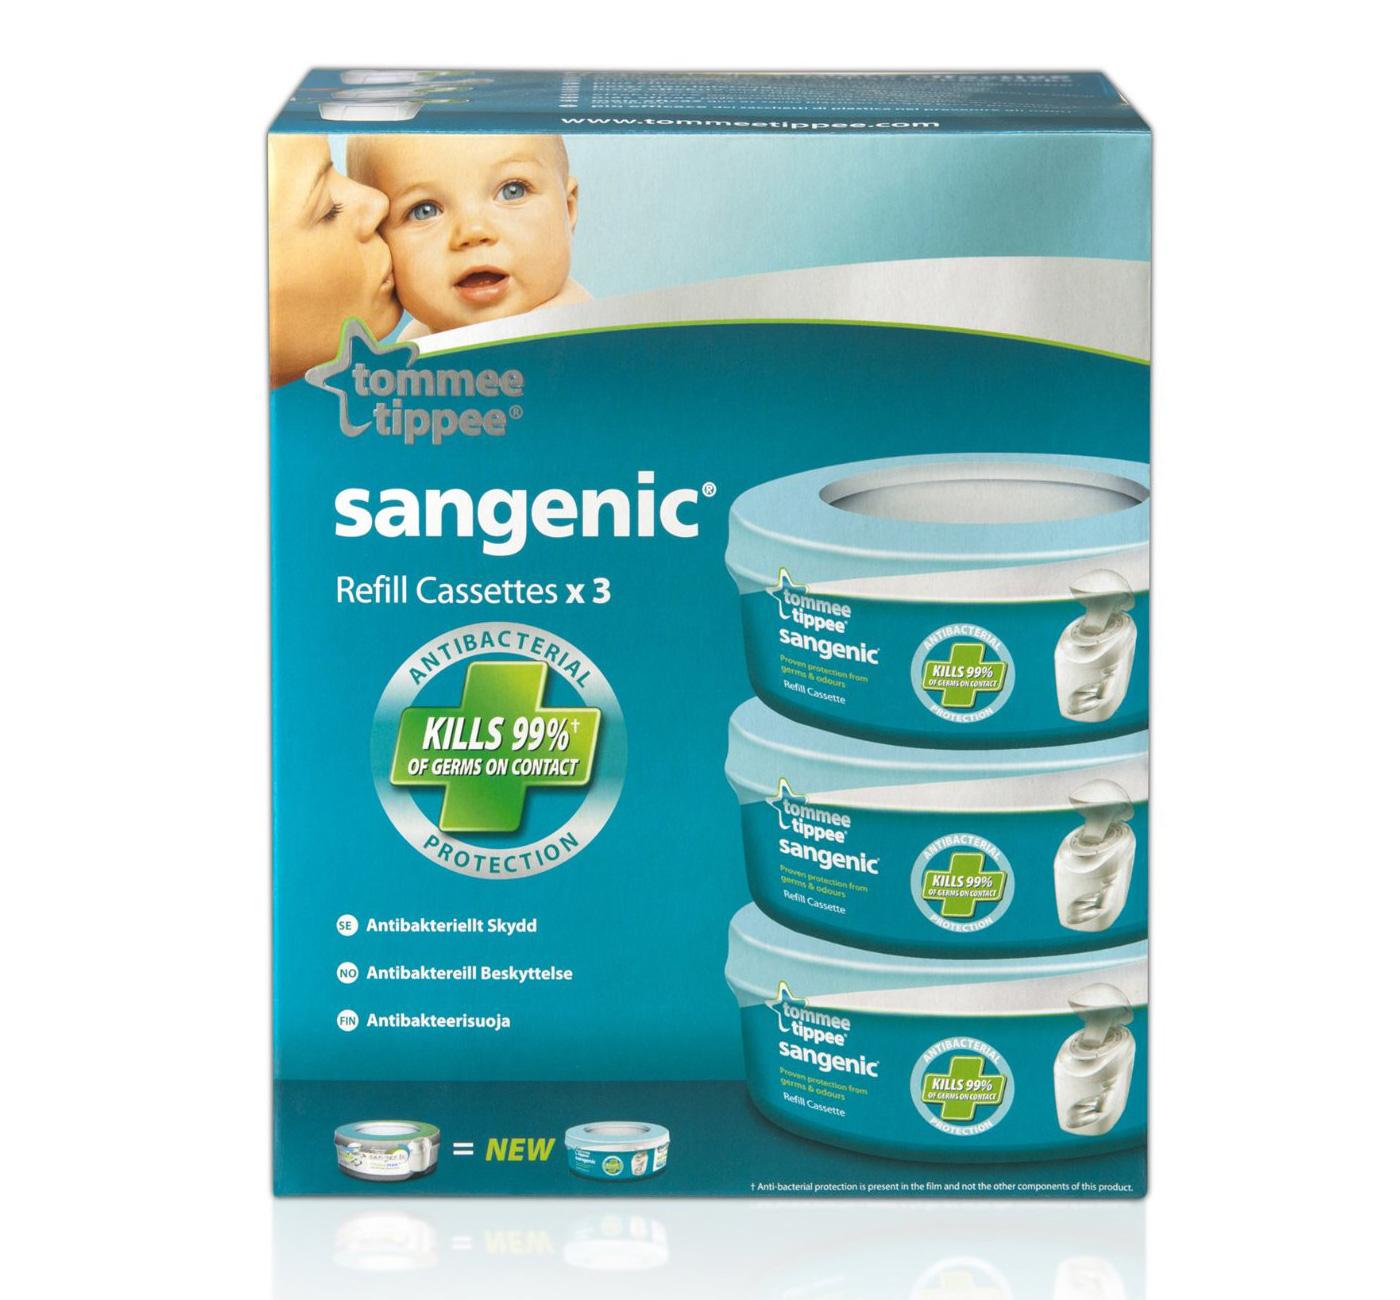 Tommee Tippee Sangenic Nursery Essentials Nappy Wrapper 3x Refill Cassettes BNIB | eBay